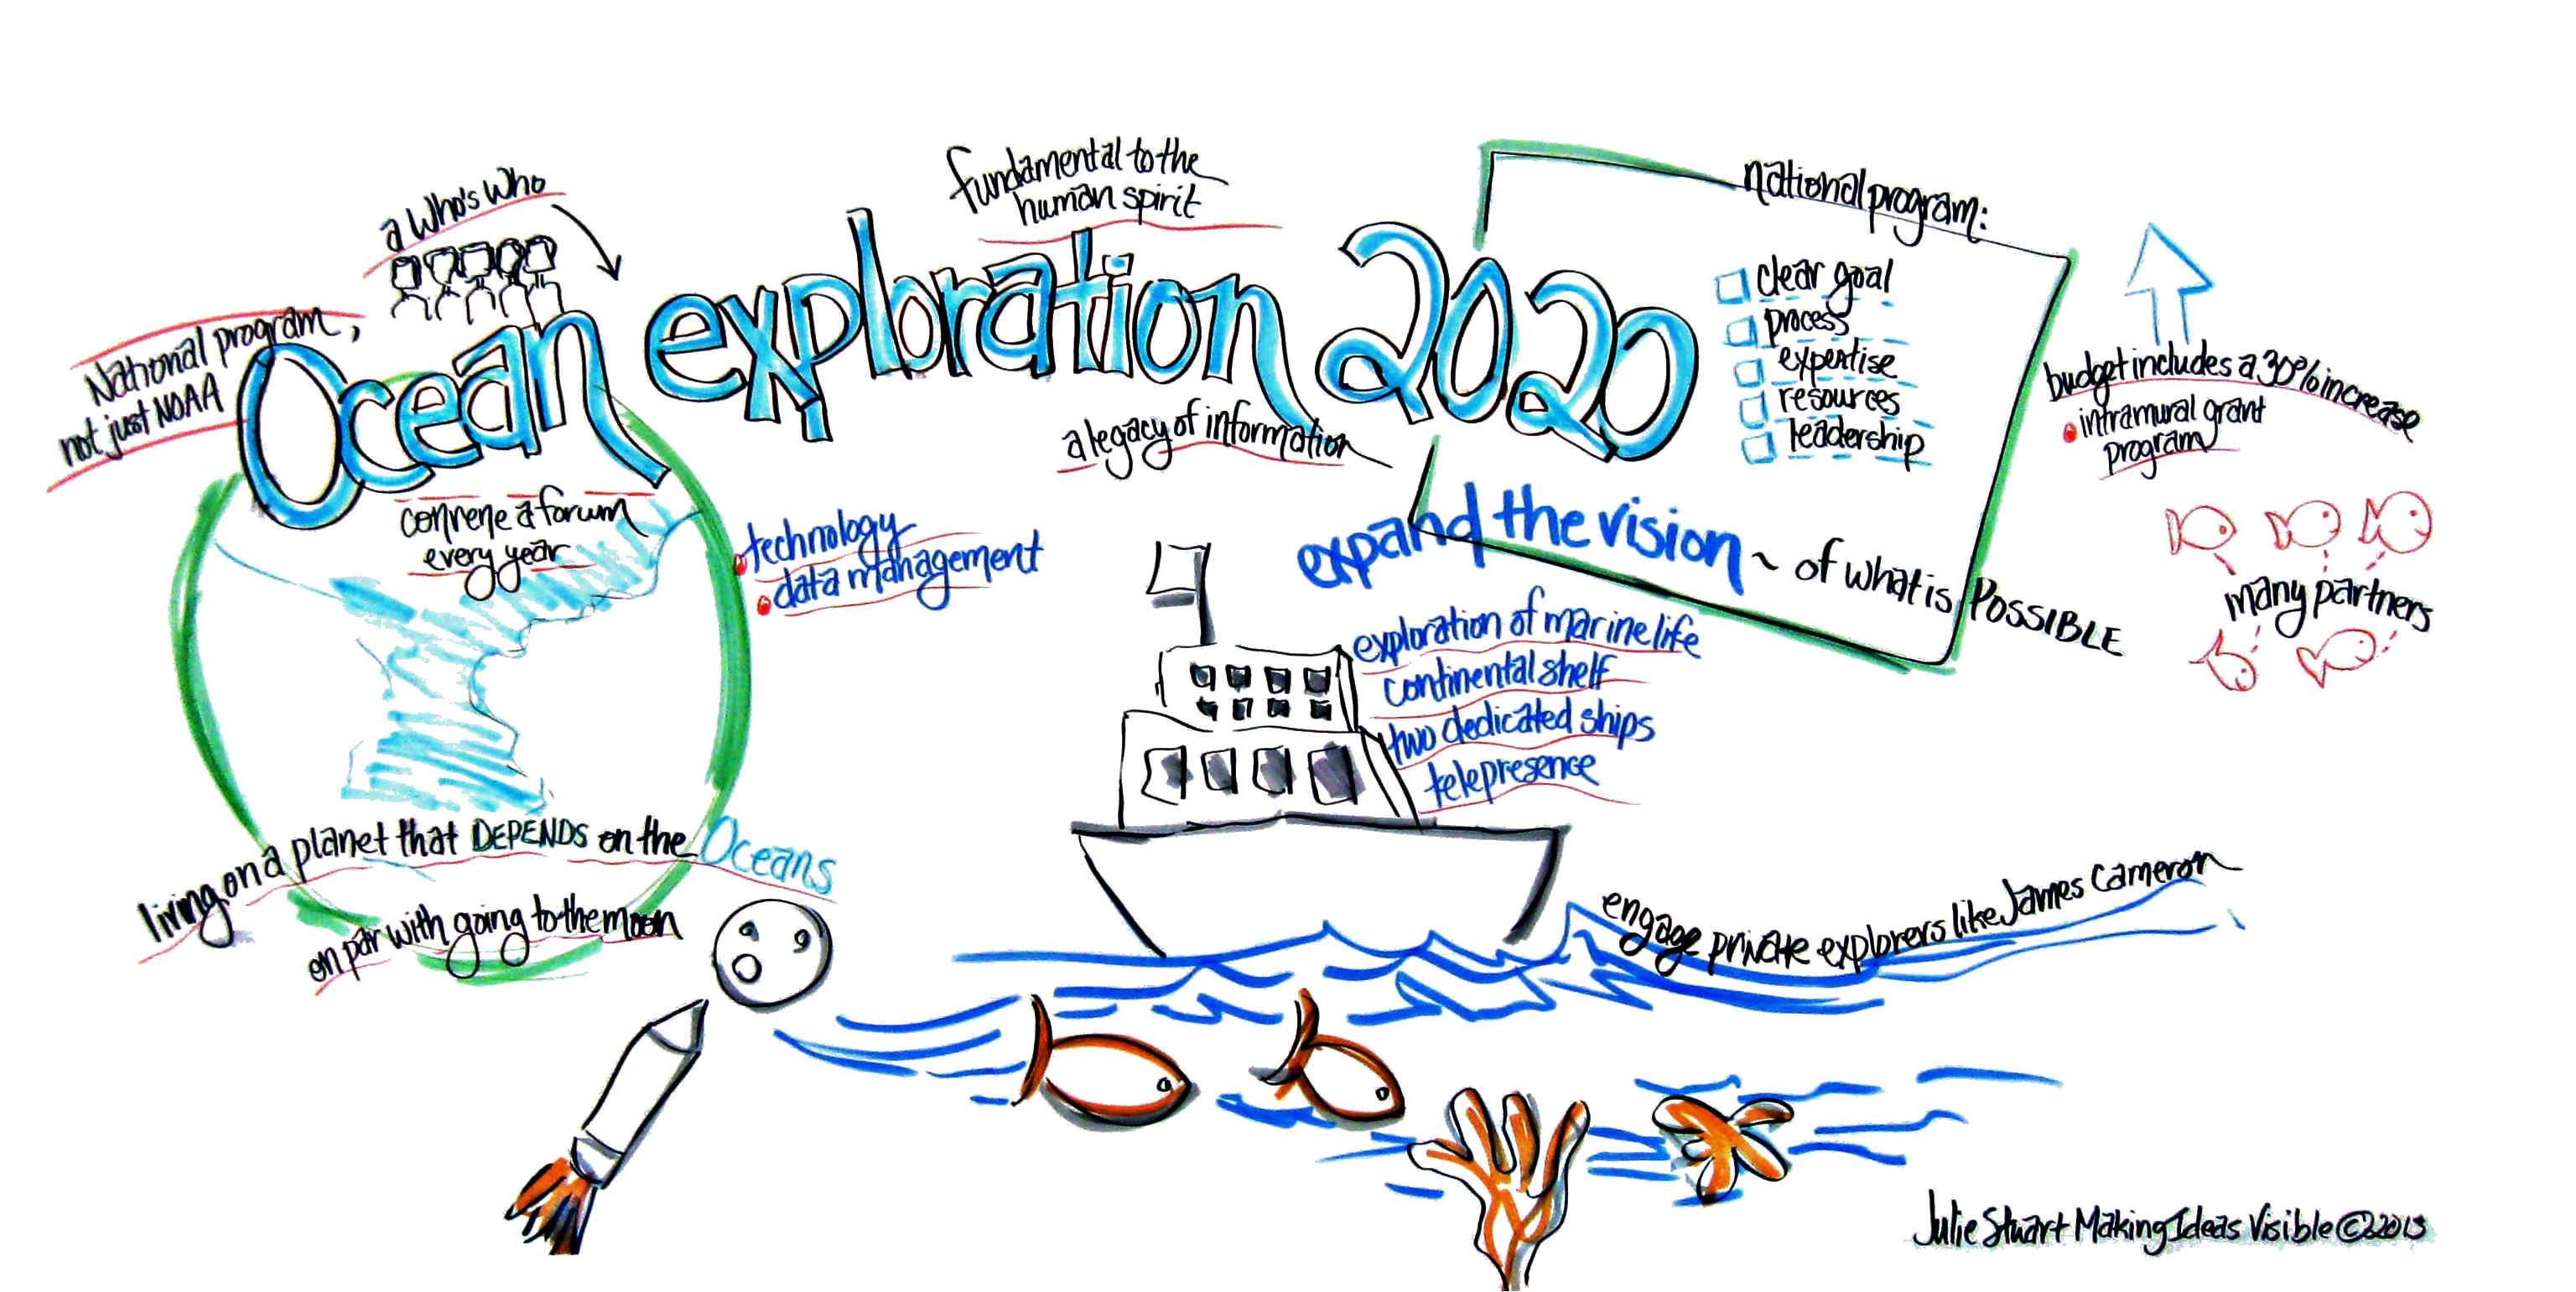 1. Ocean exploration 2020